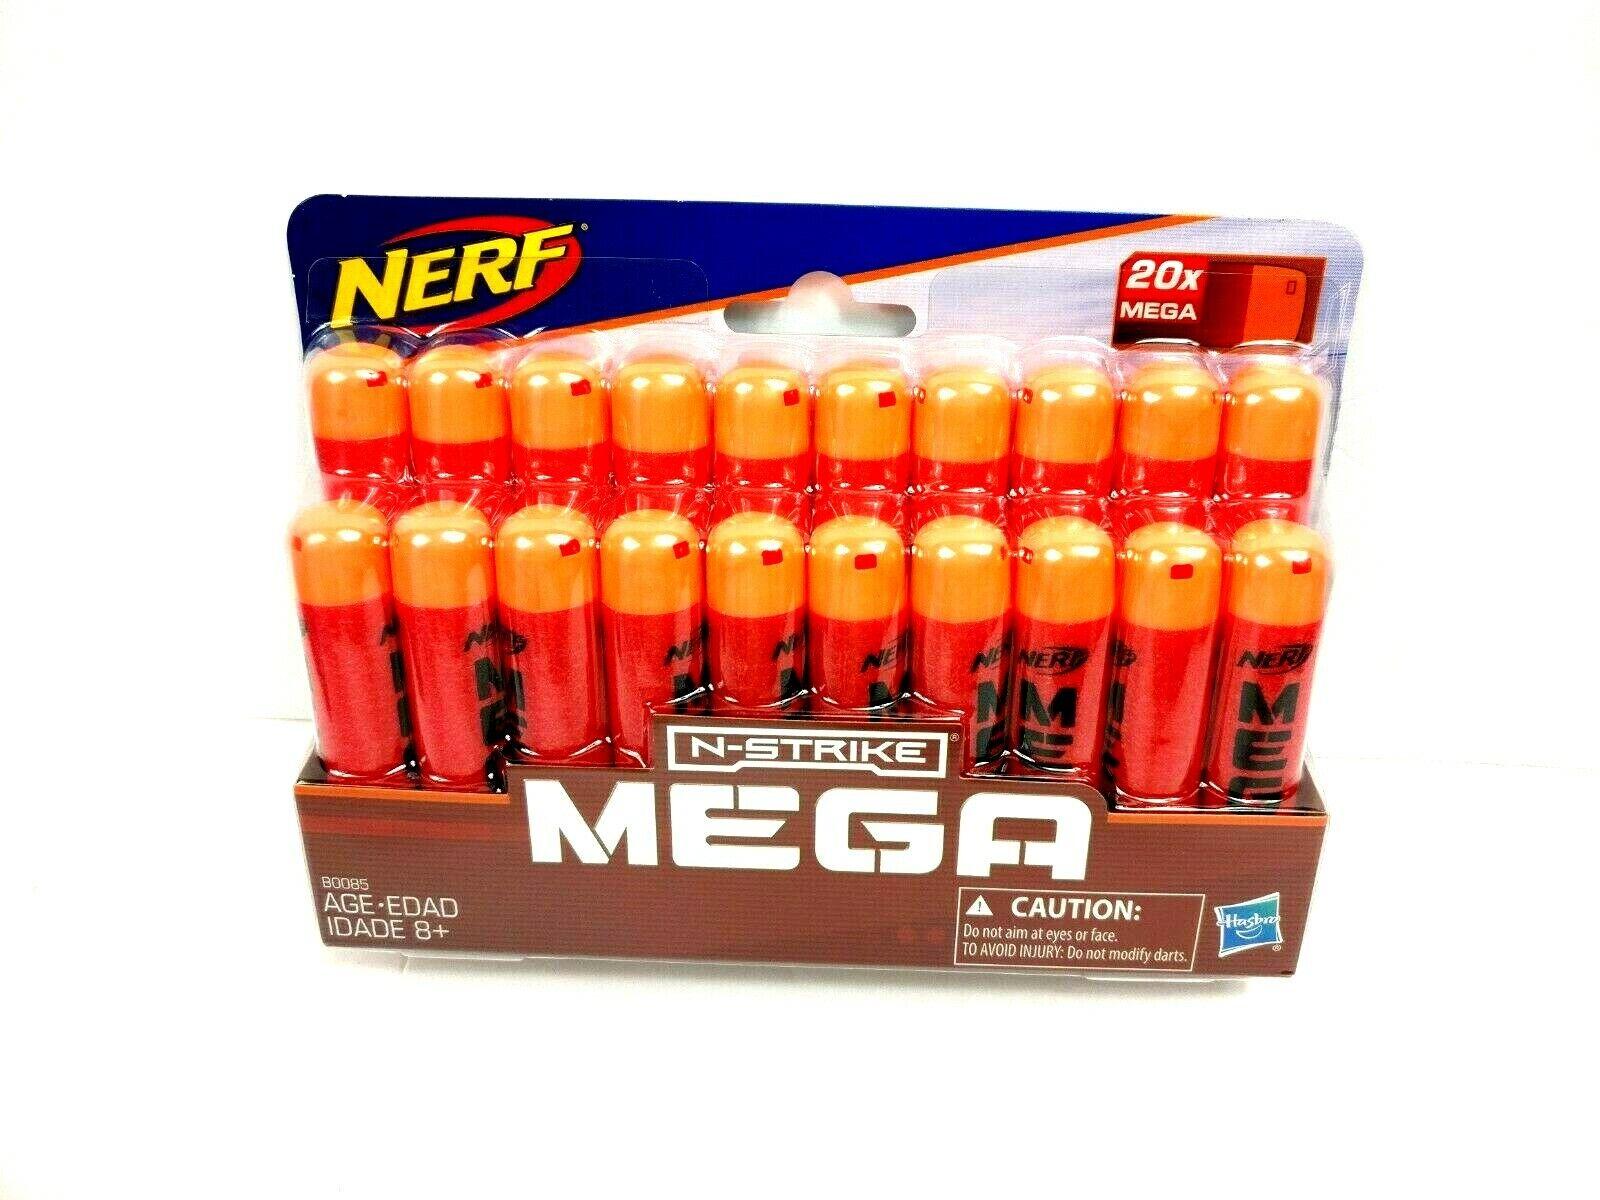 Nerf N-STRIKE Mega 20x Refill Toy Ammo Darts Hasbro New Seal